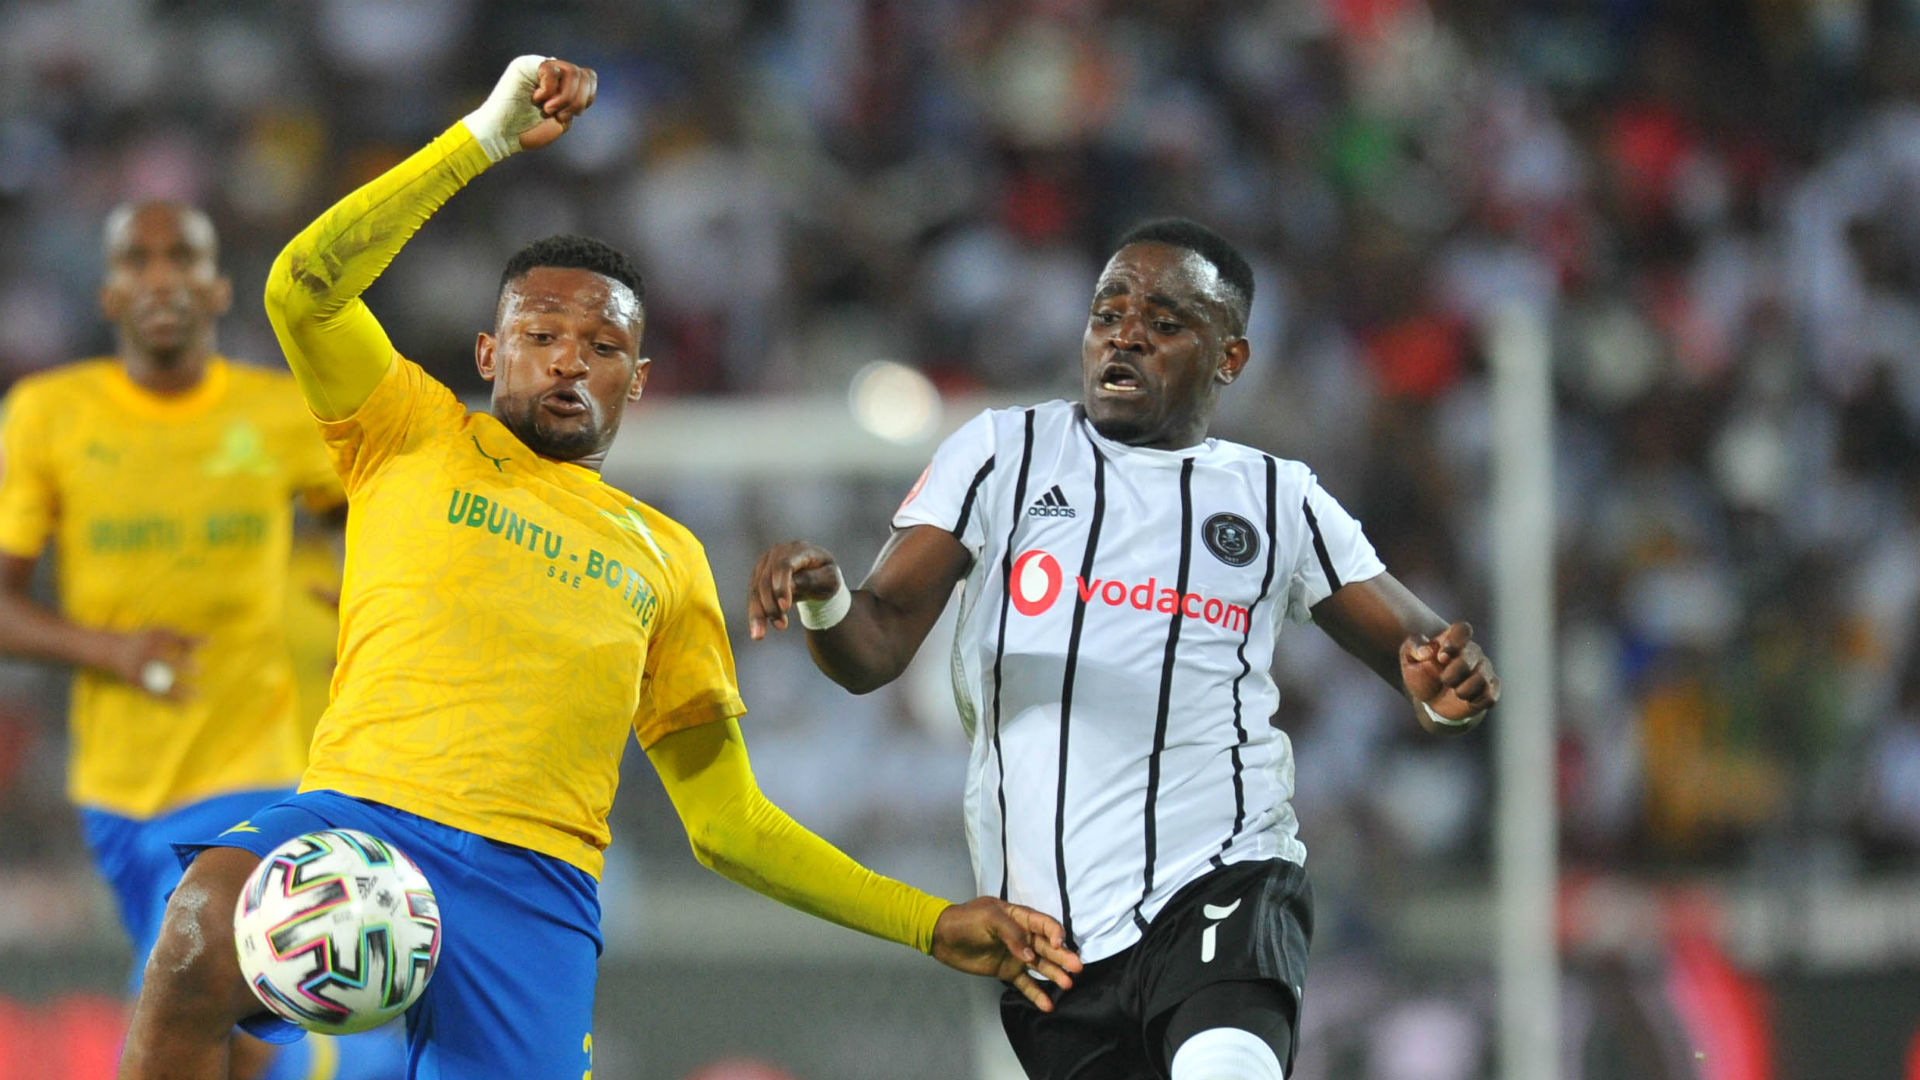 Orlando Pirates 1-0 Mamelodi Sundowns - Player Ratings: Mhango the top performer